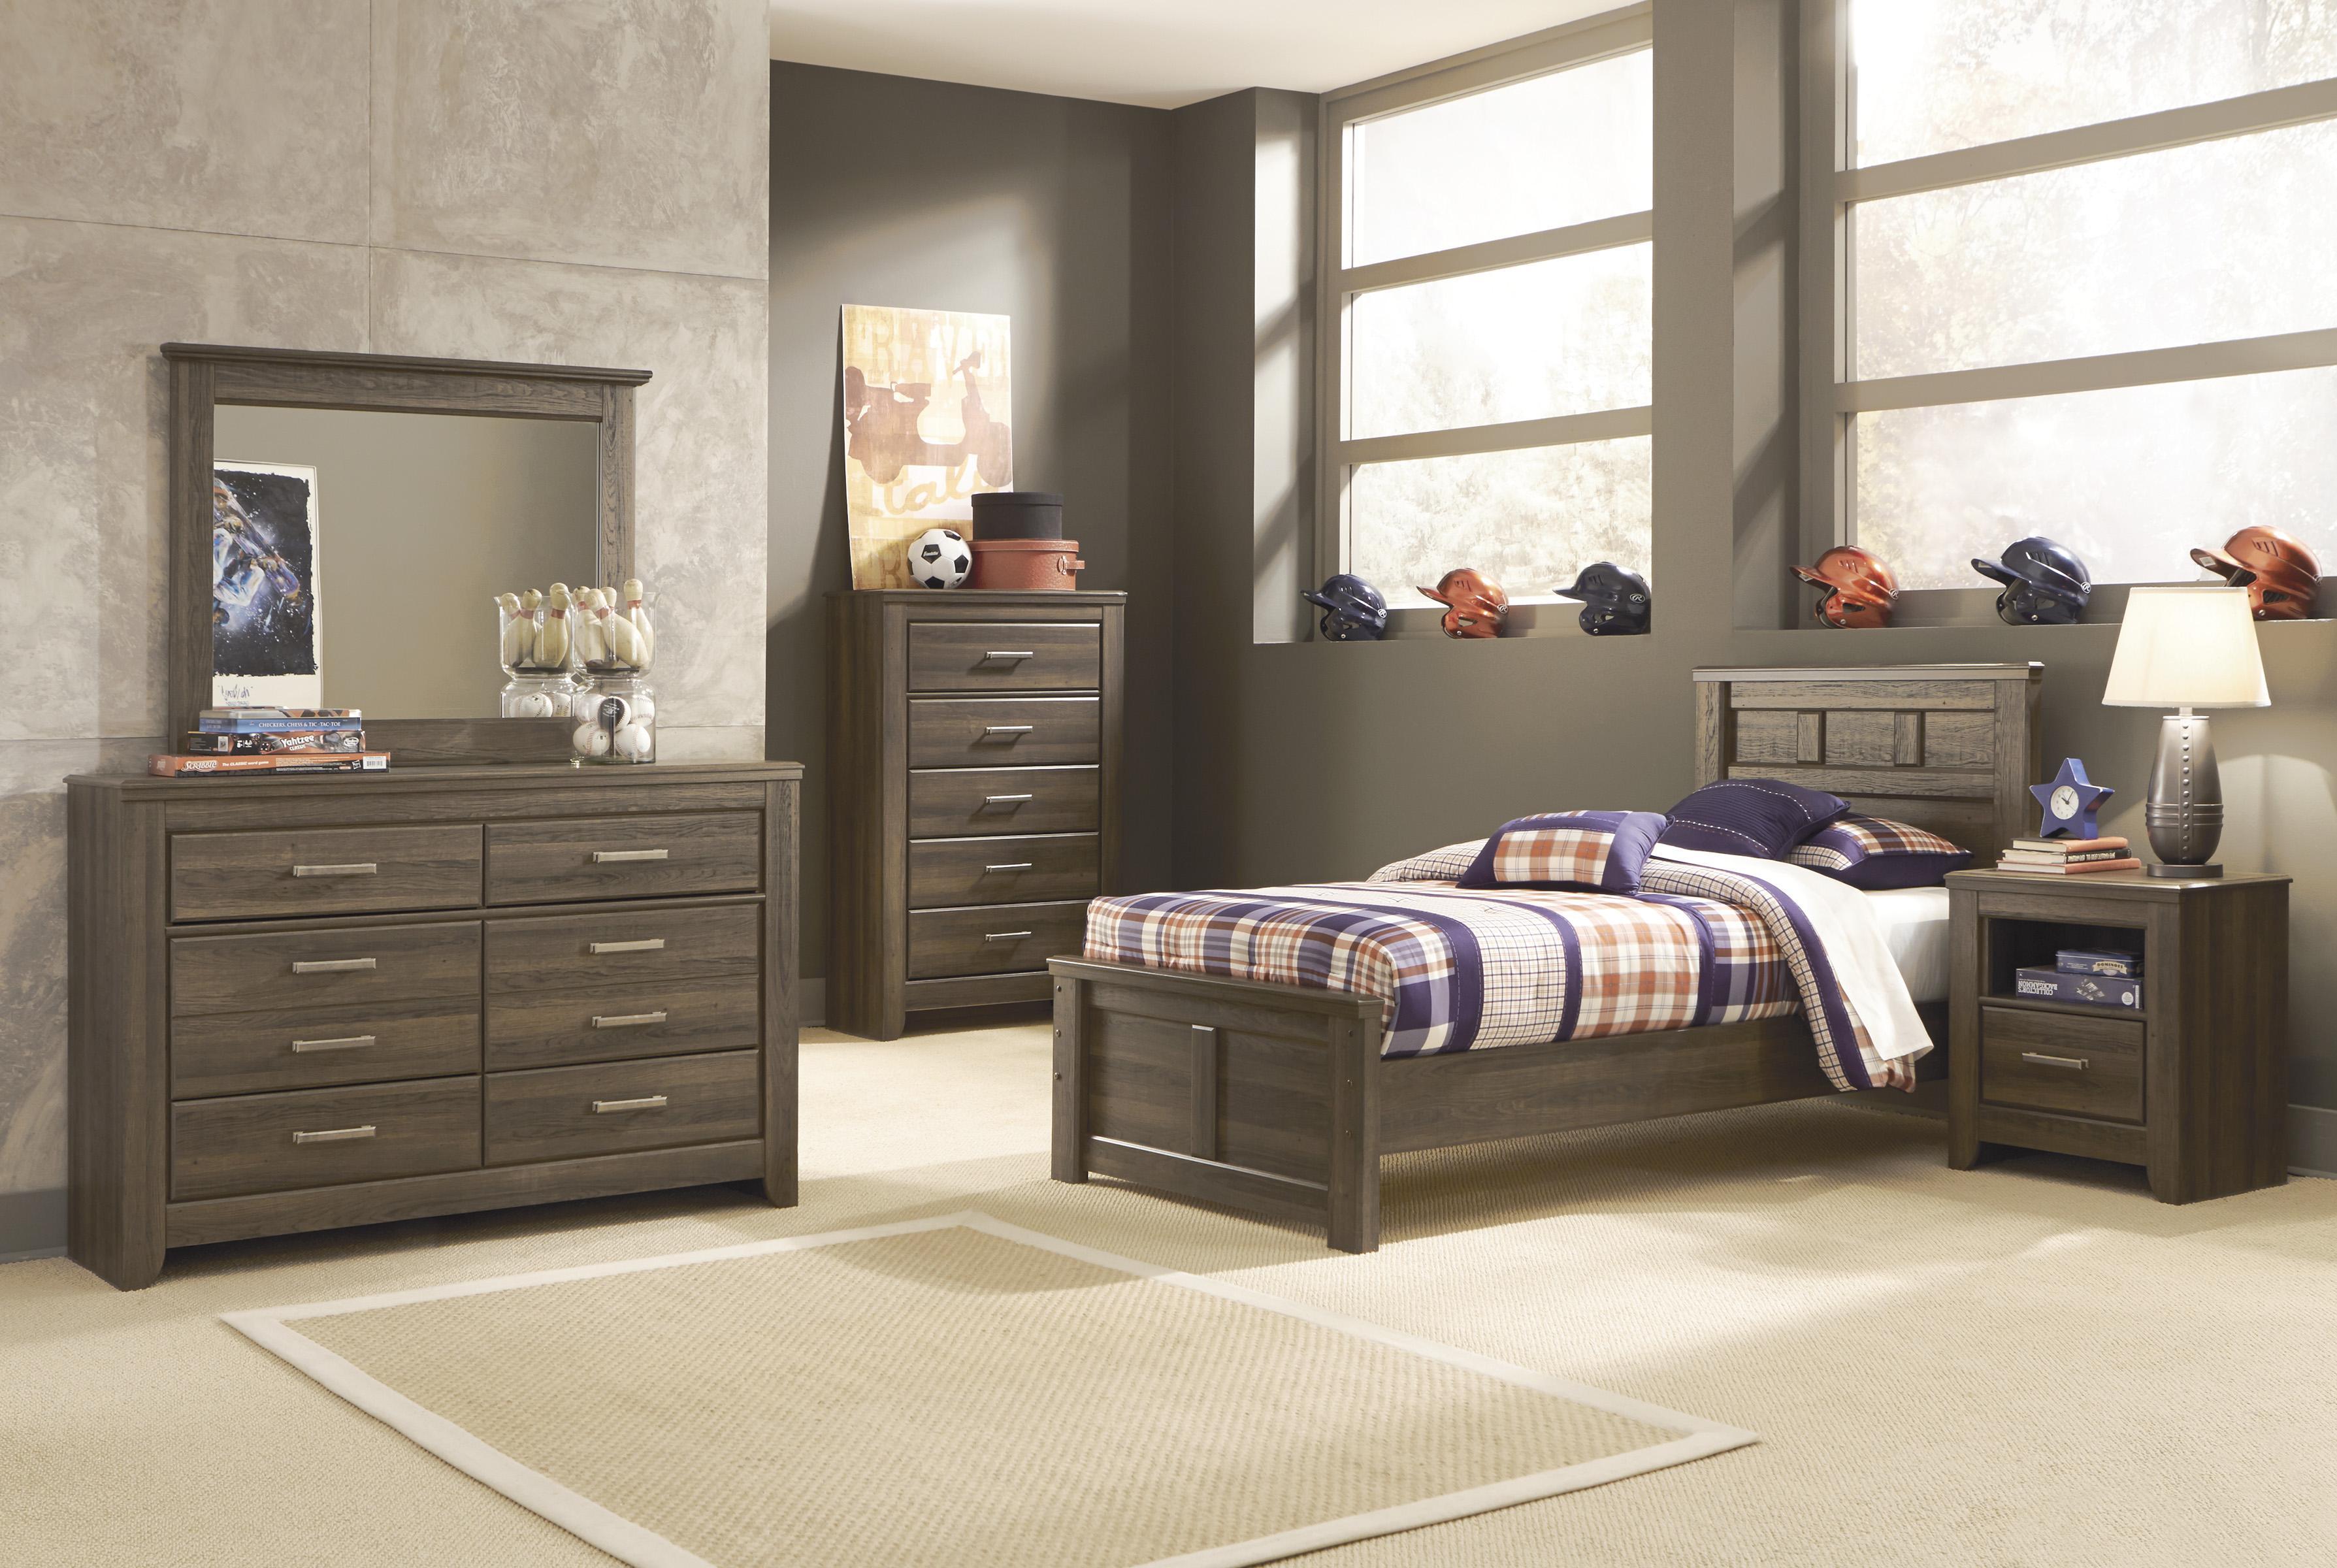 Ashleys Twin Bed